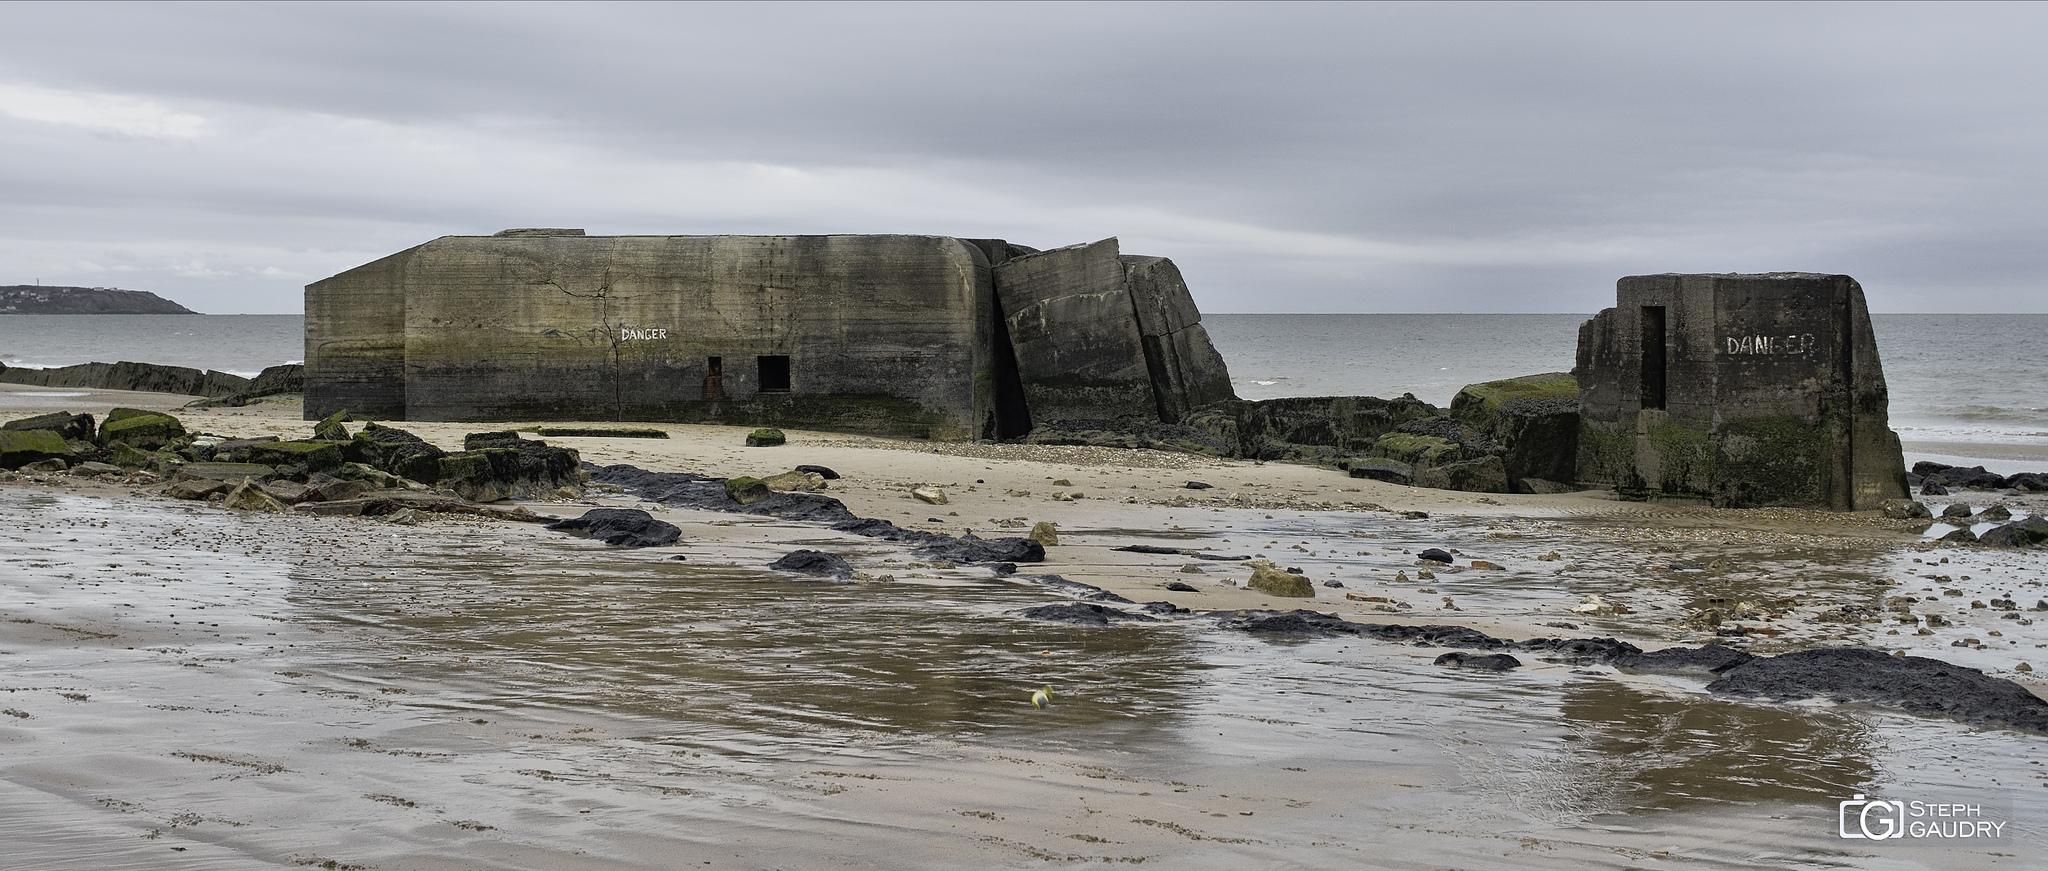 Stp Pommern - R630 on the beach [Click to start slideshow]